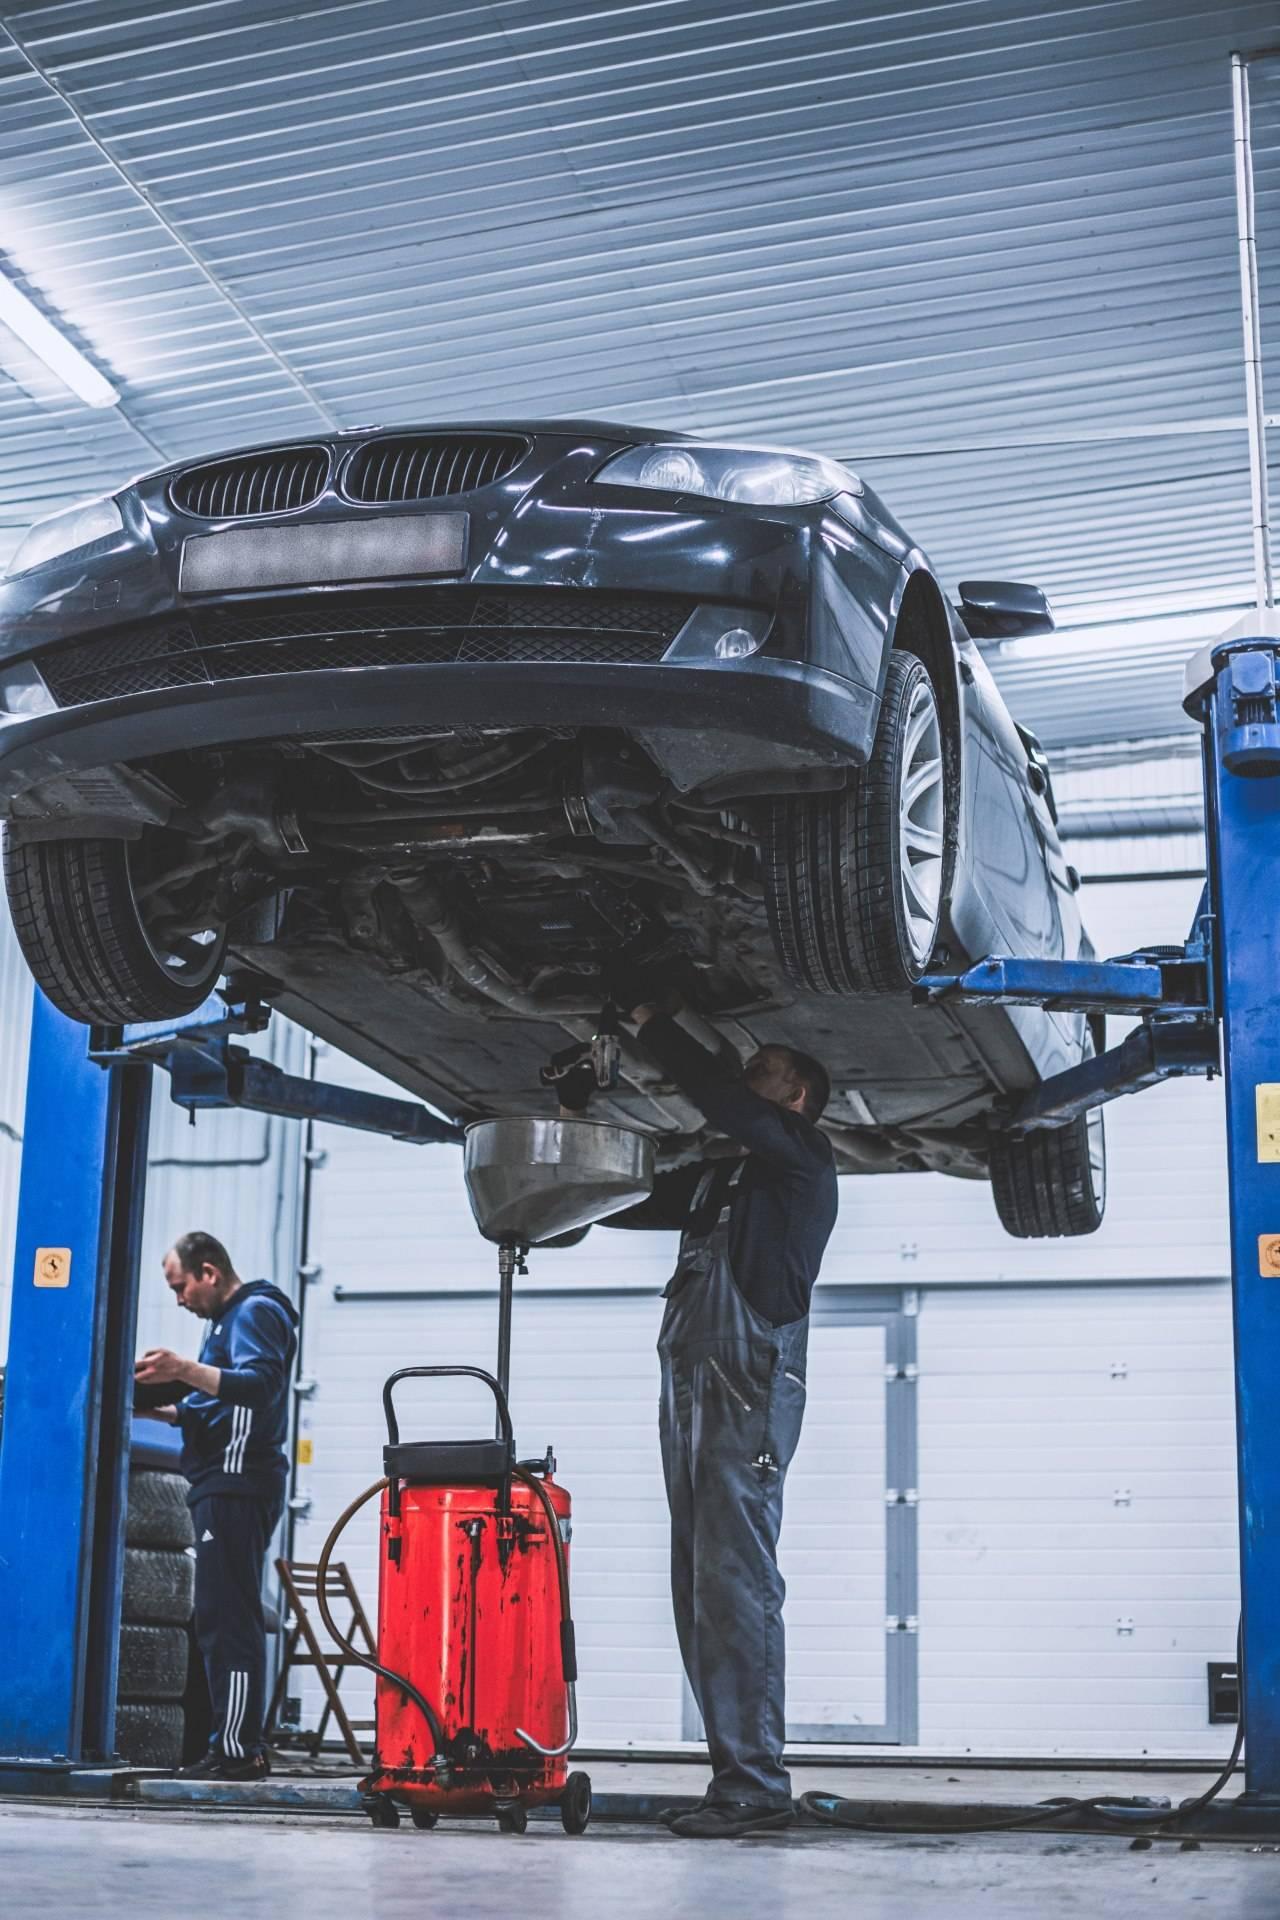 Замена масла АКПП ZF GA6HP19 на BMW 520d E60 2